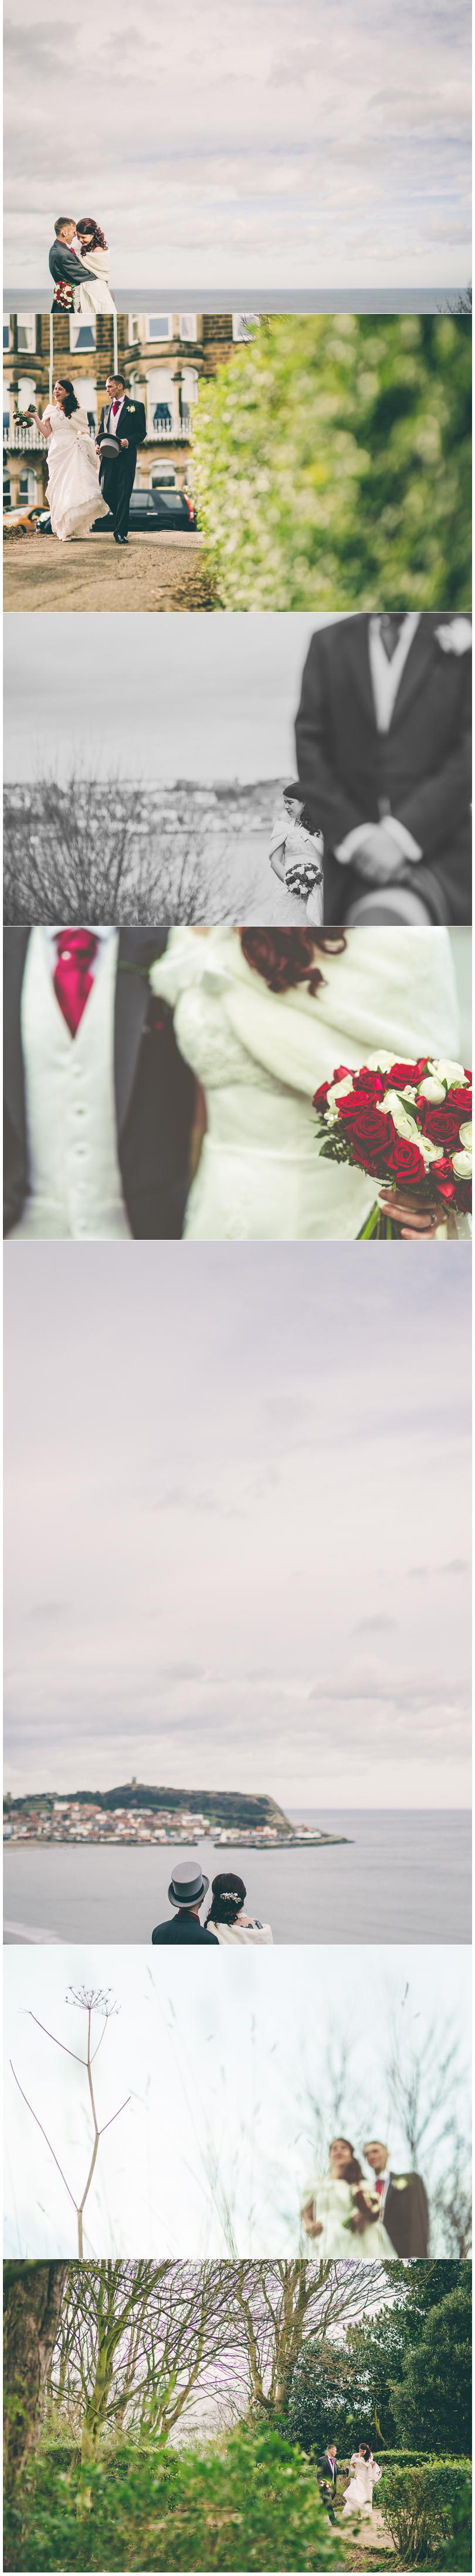 Neil_Jackson_Photographic_Scarborough_York_Yorkshire_Wedding_Photographer_Jo_Ash_Ambassador_Spa_Hotel_Scarborough_Wedding_Blog6